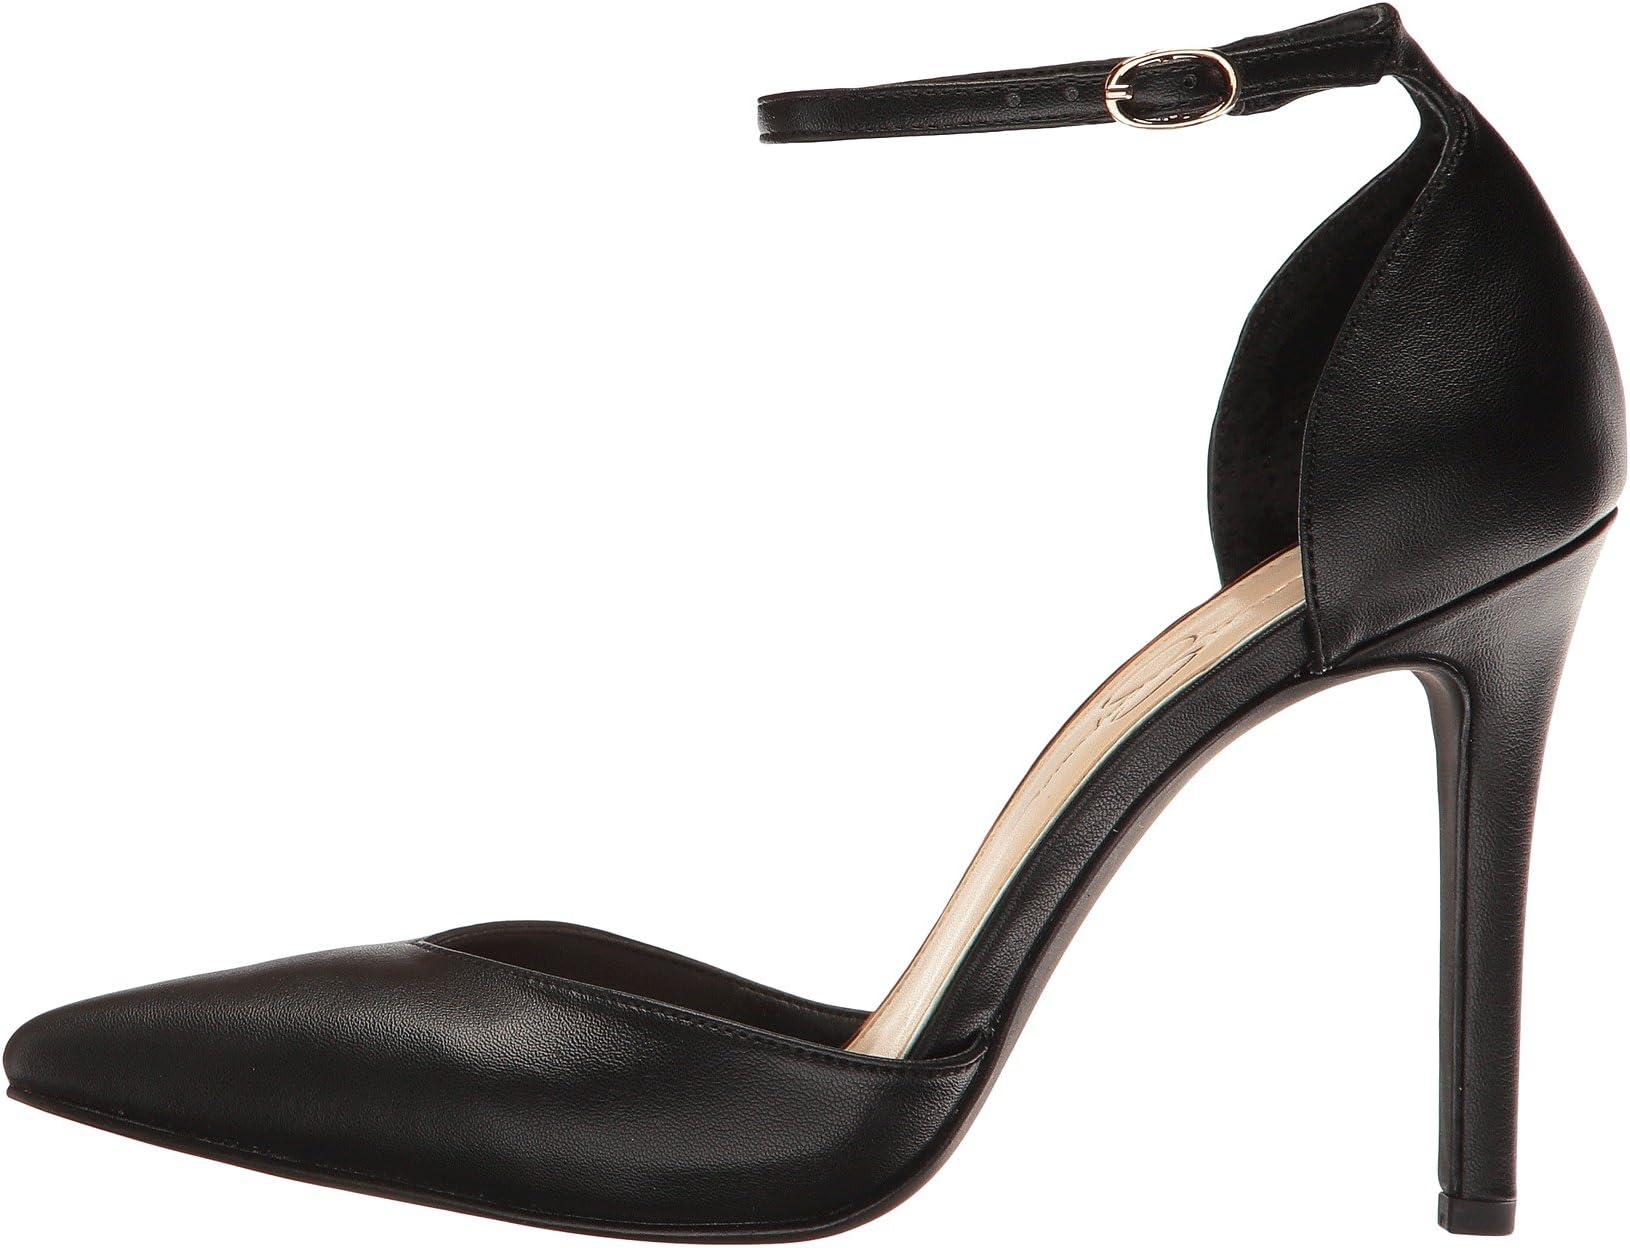 Jessica Simpson Cirrus | Women's shoes | 2020 Newest